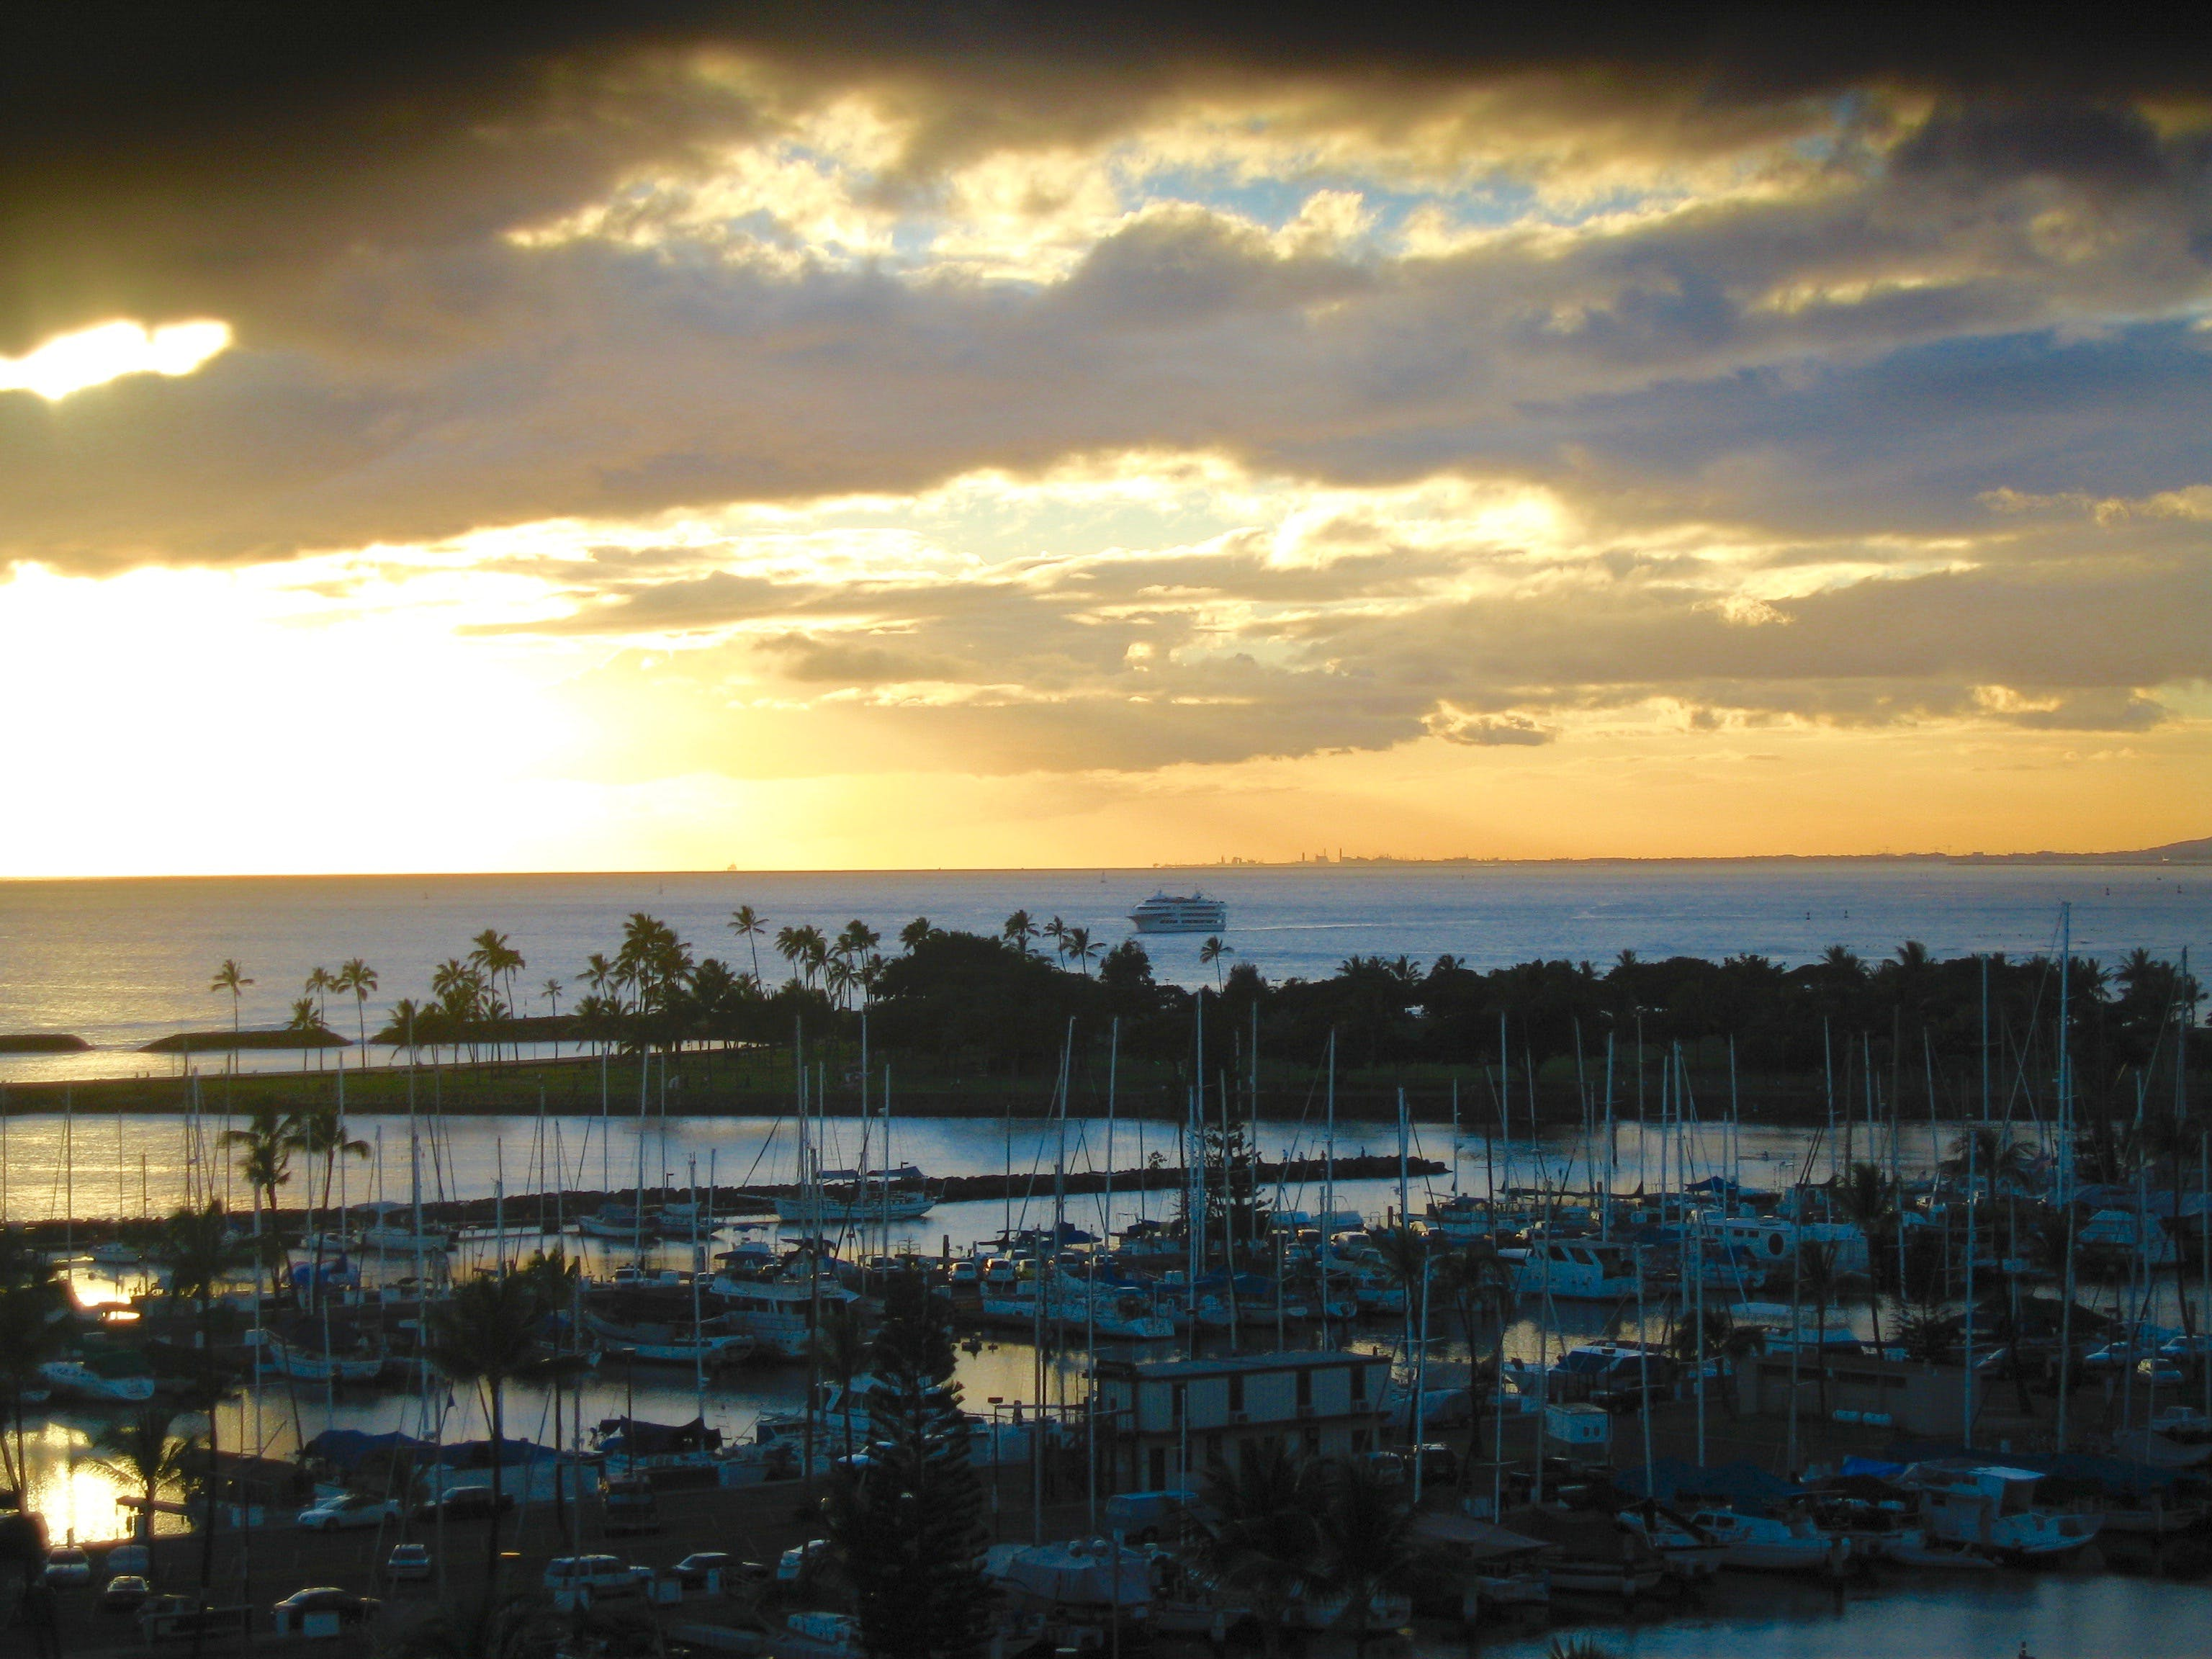 Free stock photo of marina, palm trees, sail, sailboat